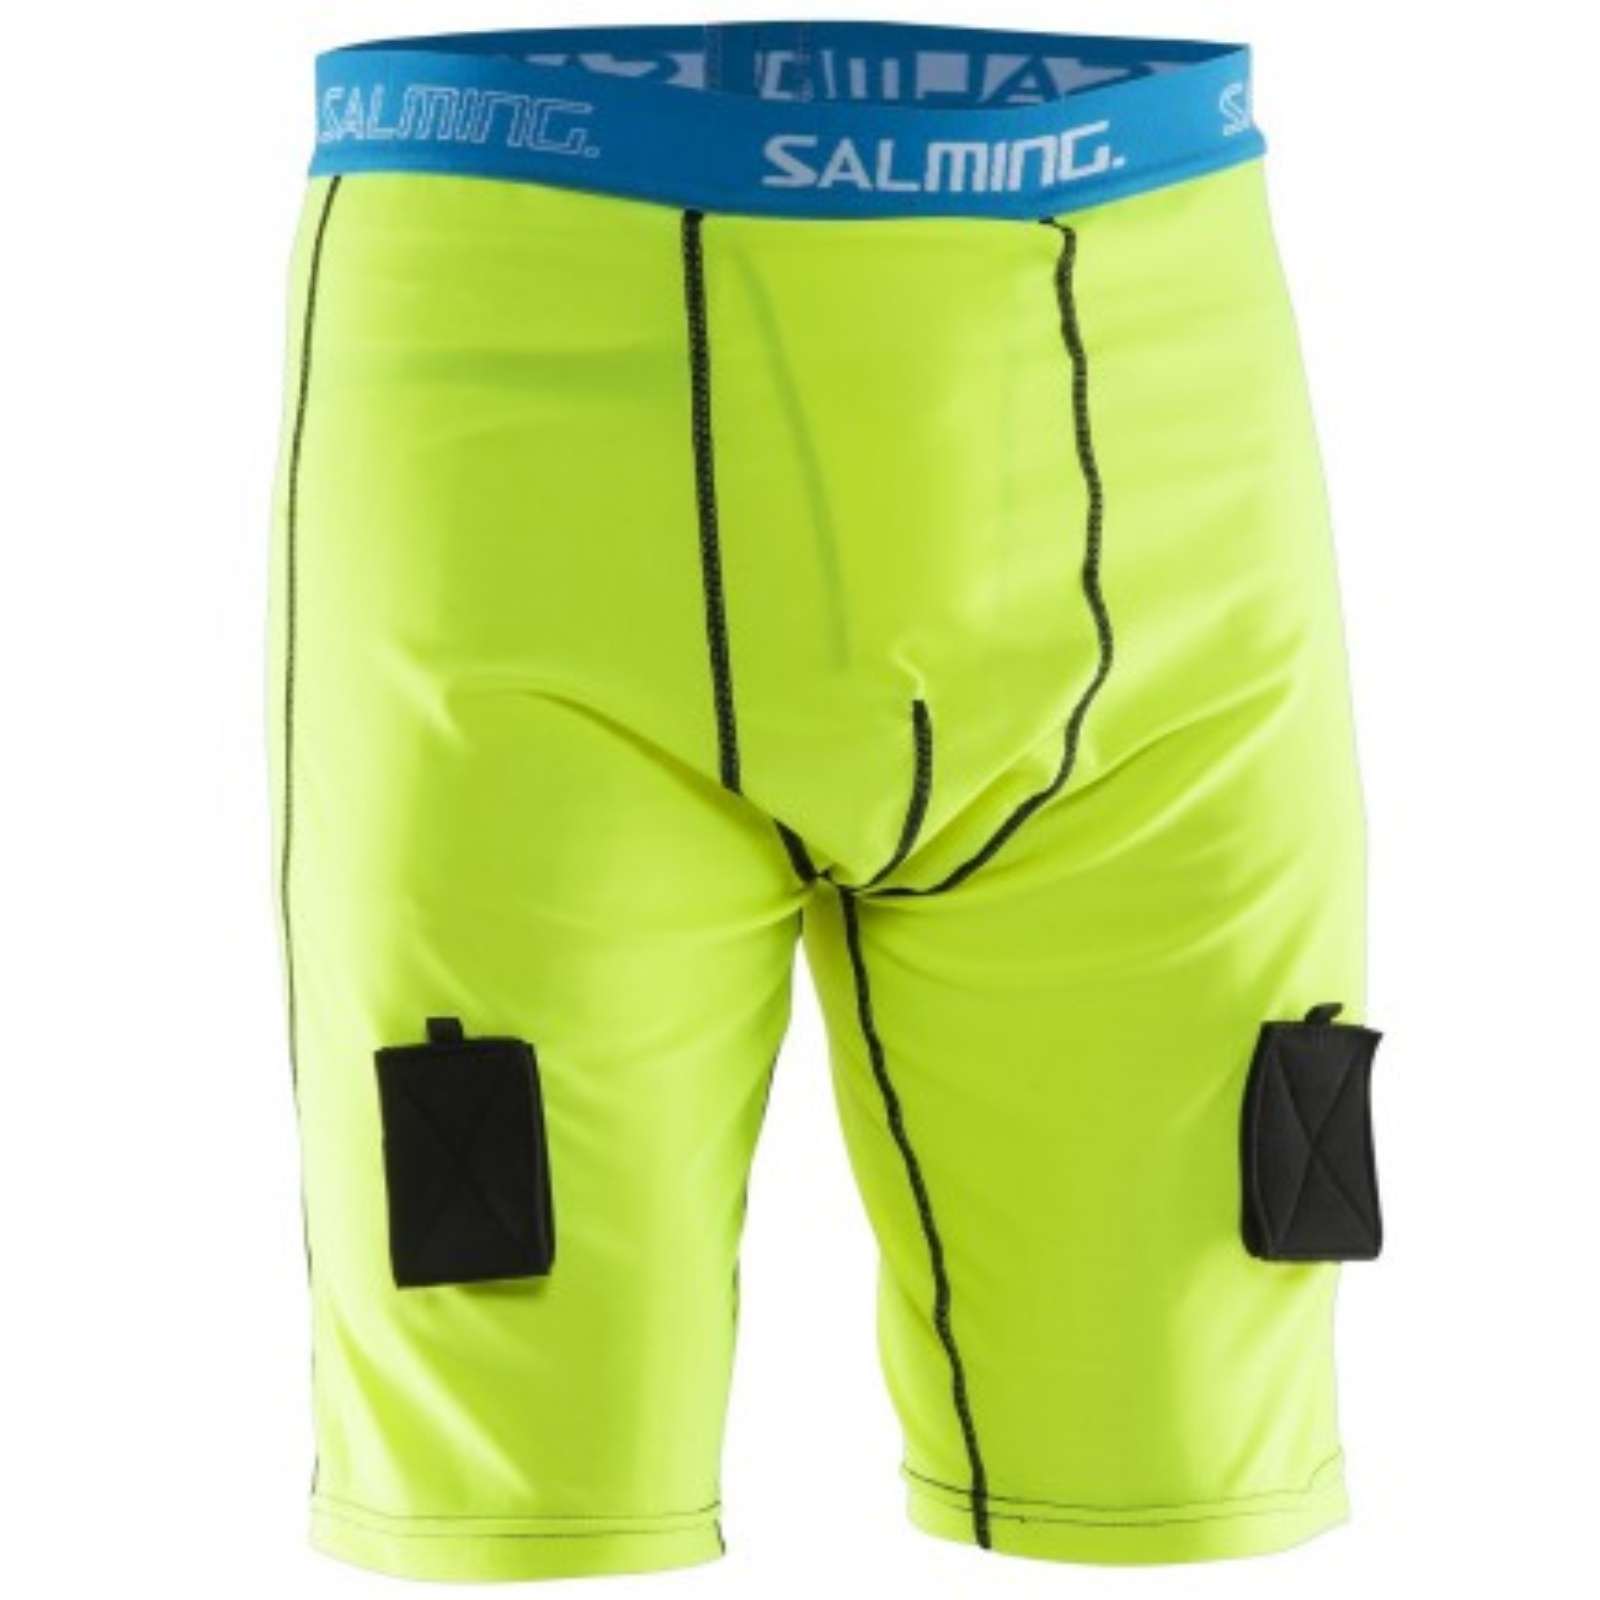 Hokejové šortky SALMING Comp Jock Short Pant vel. XL